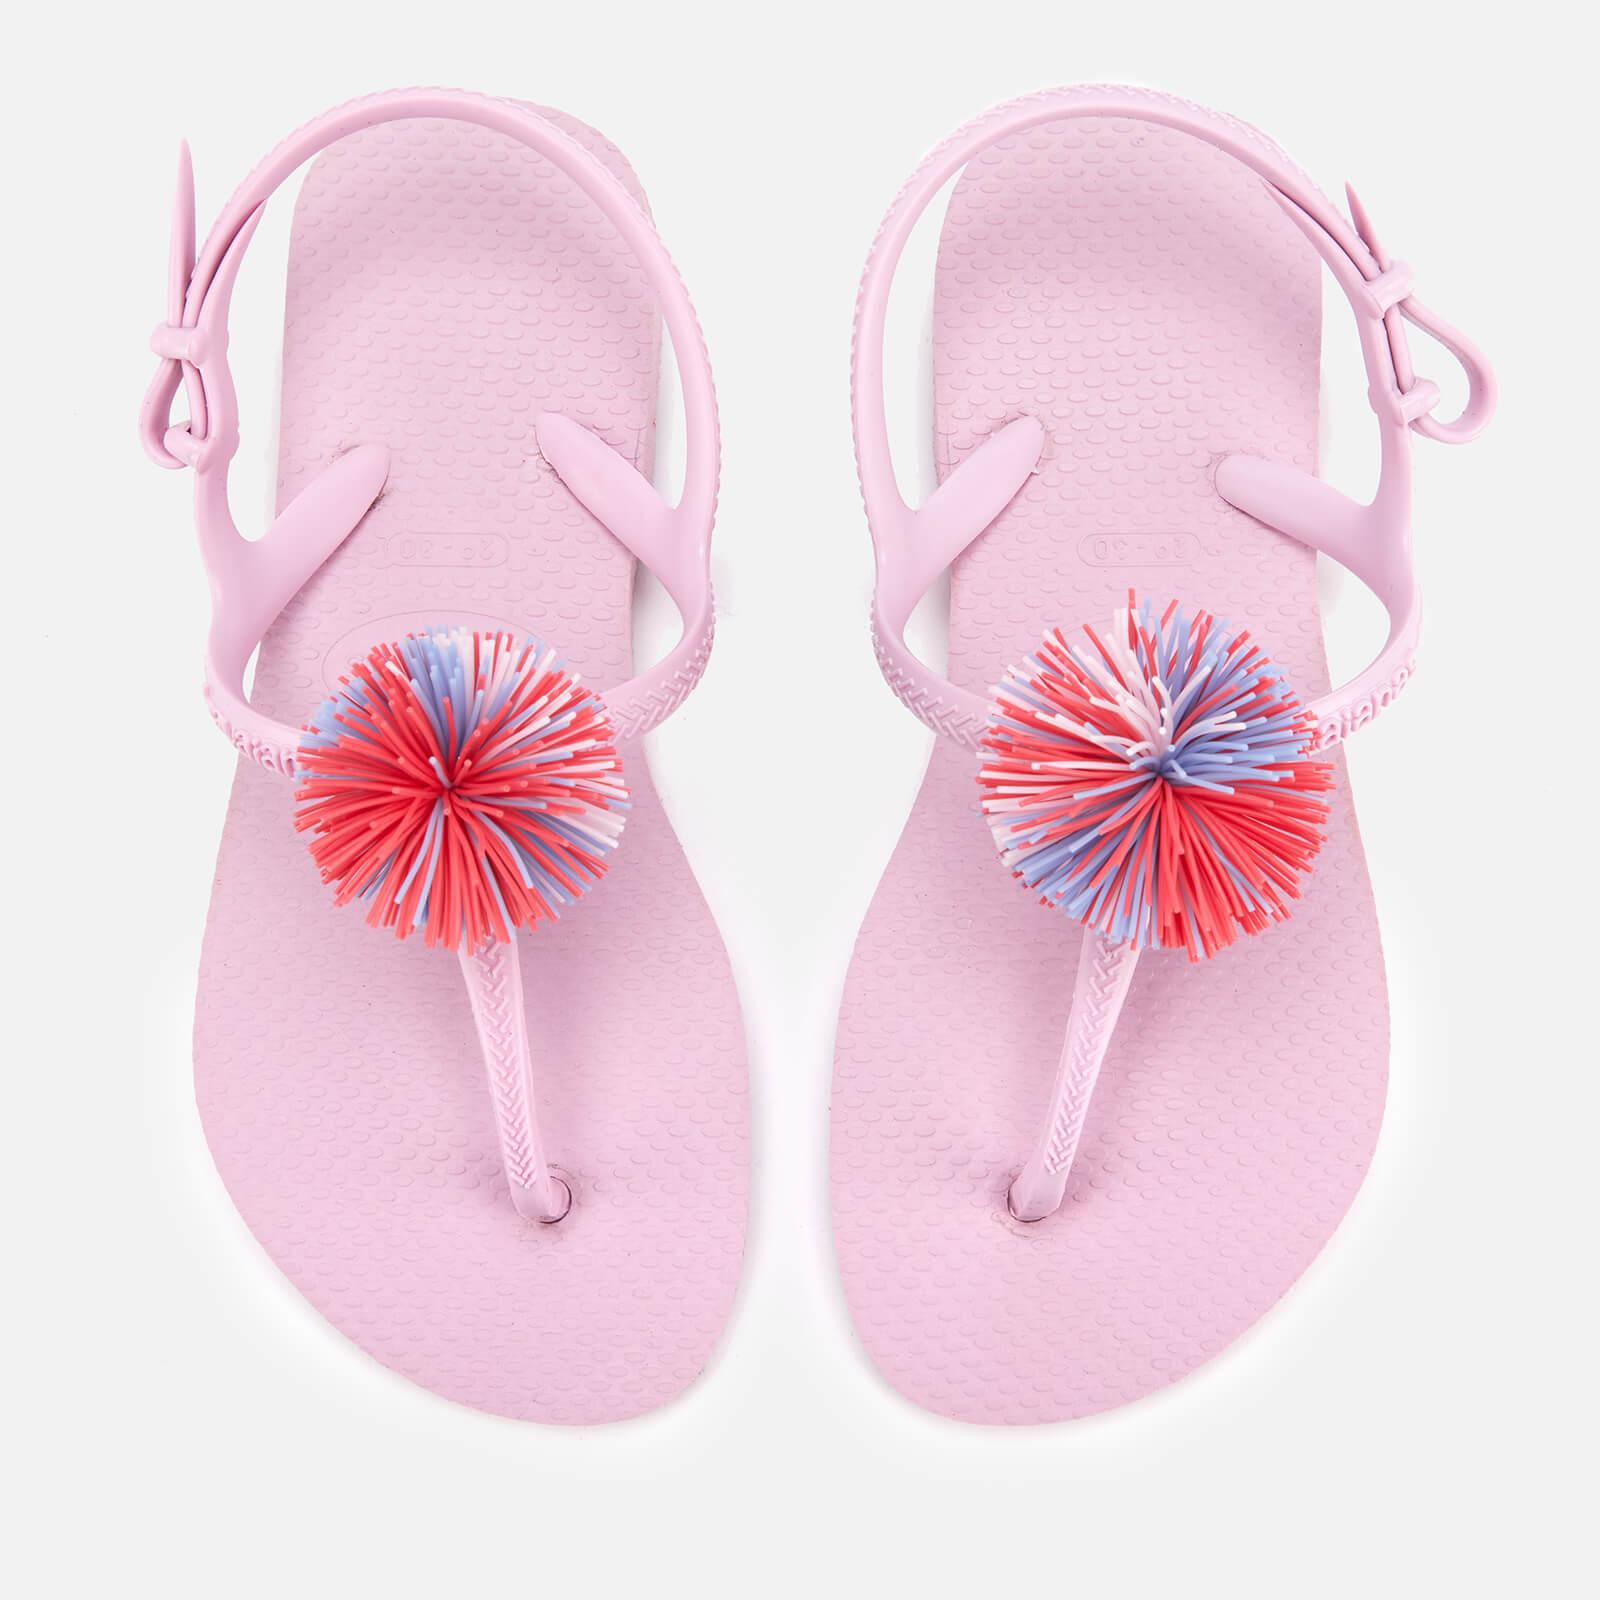 Havaianas Kids' Freedom Sl Pompom Sandals - Rose Quartz - EU 25-26/UK 8-9 Kids - Pink